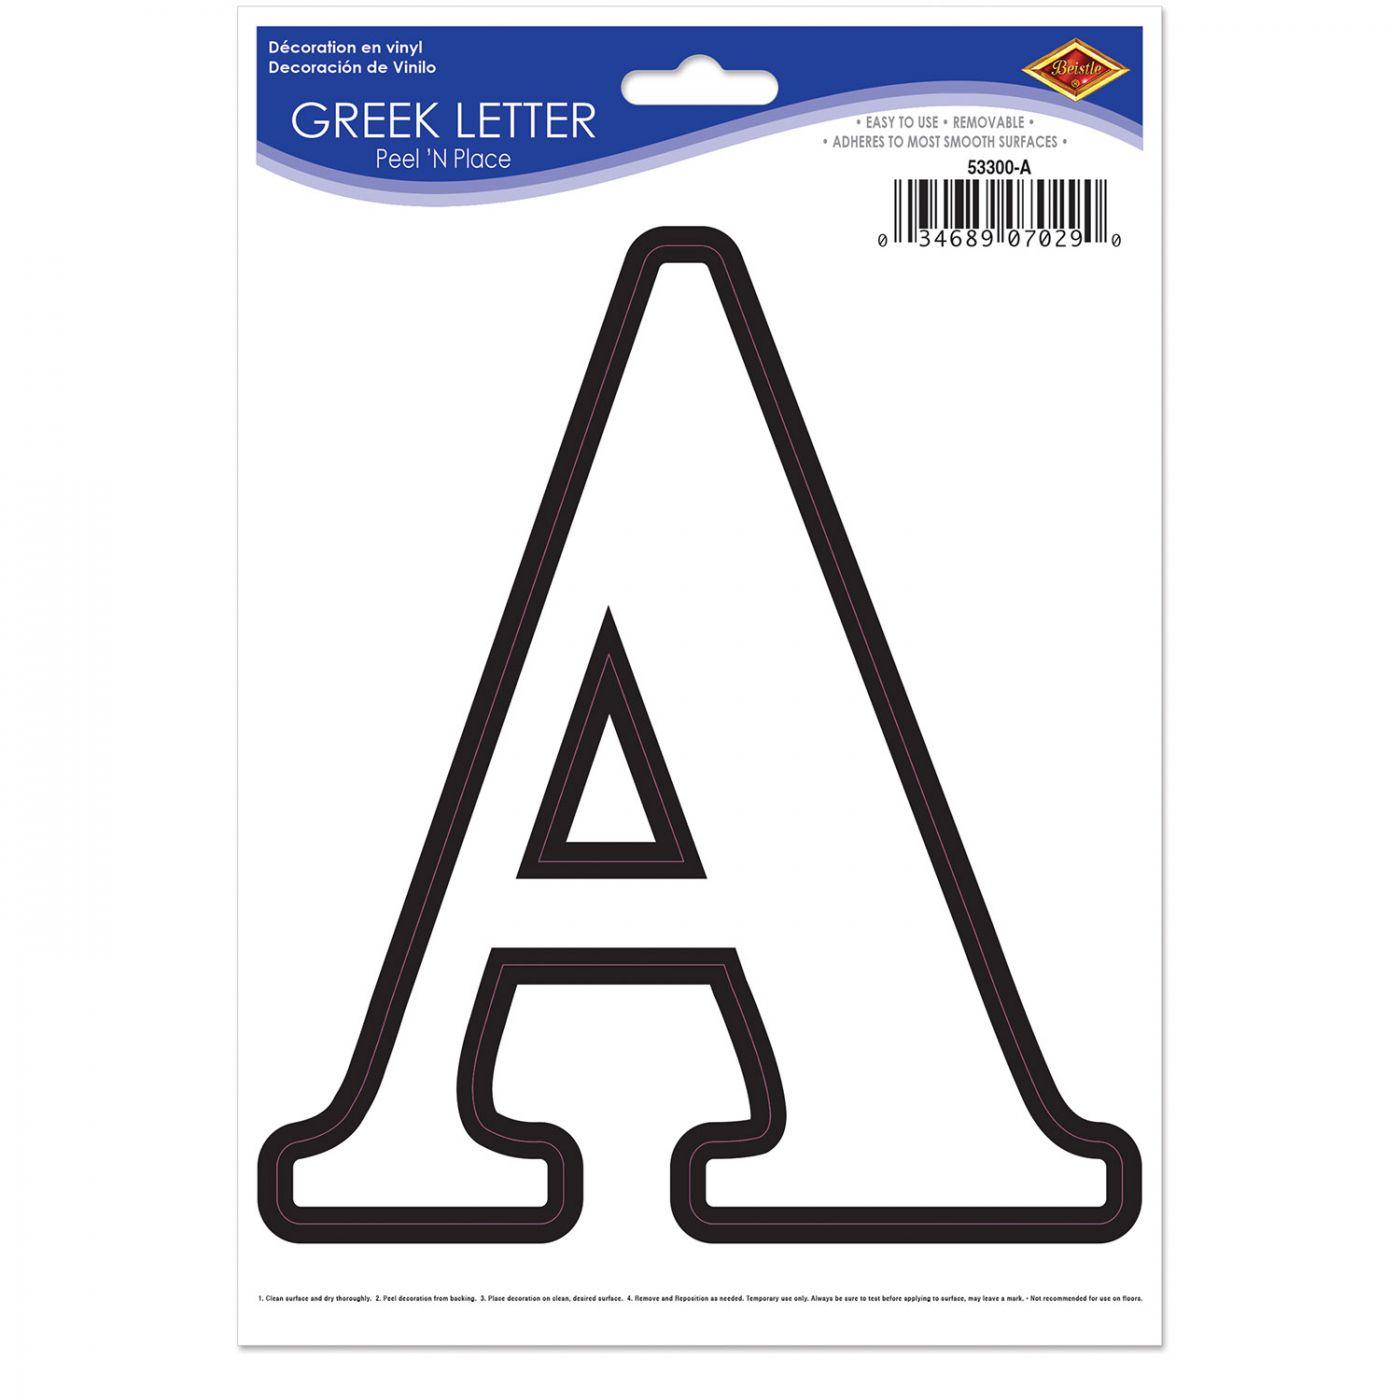 Image of Greek Letter Peel 'N Place